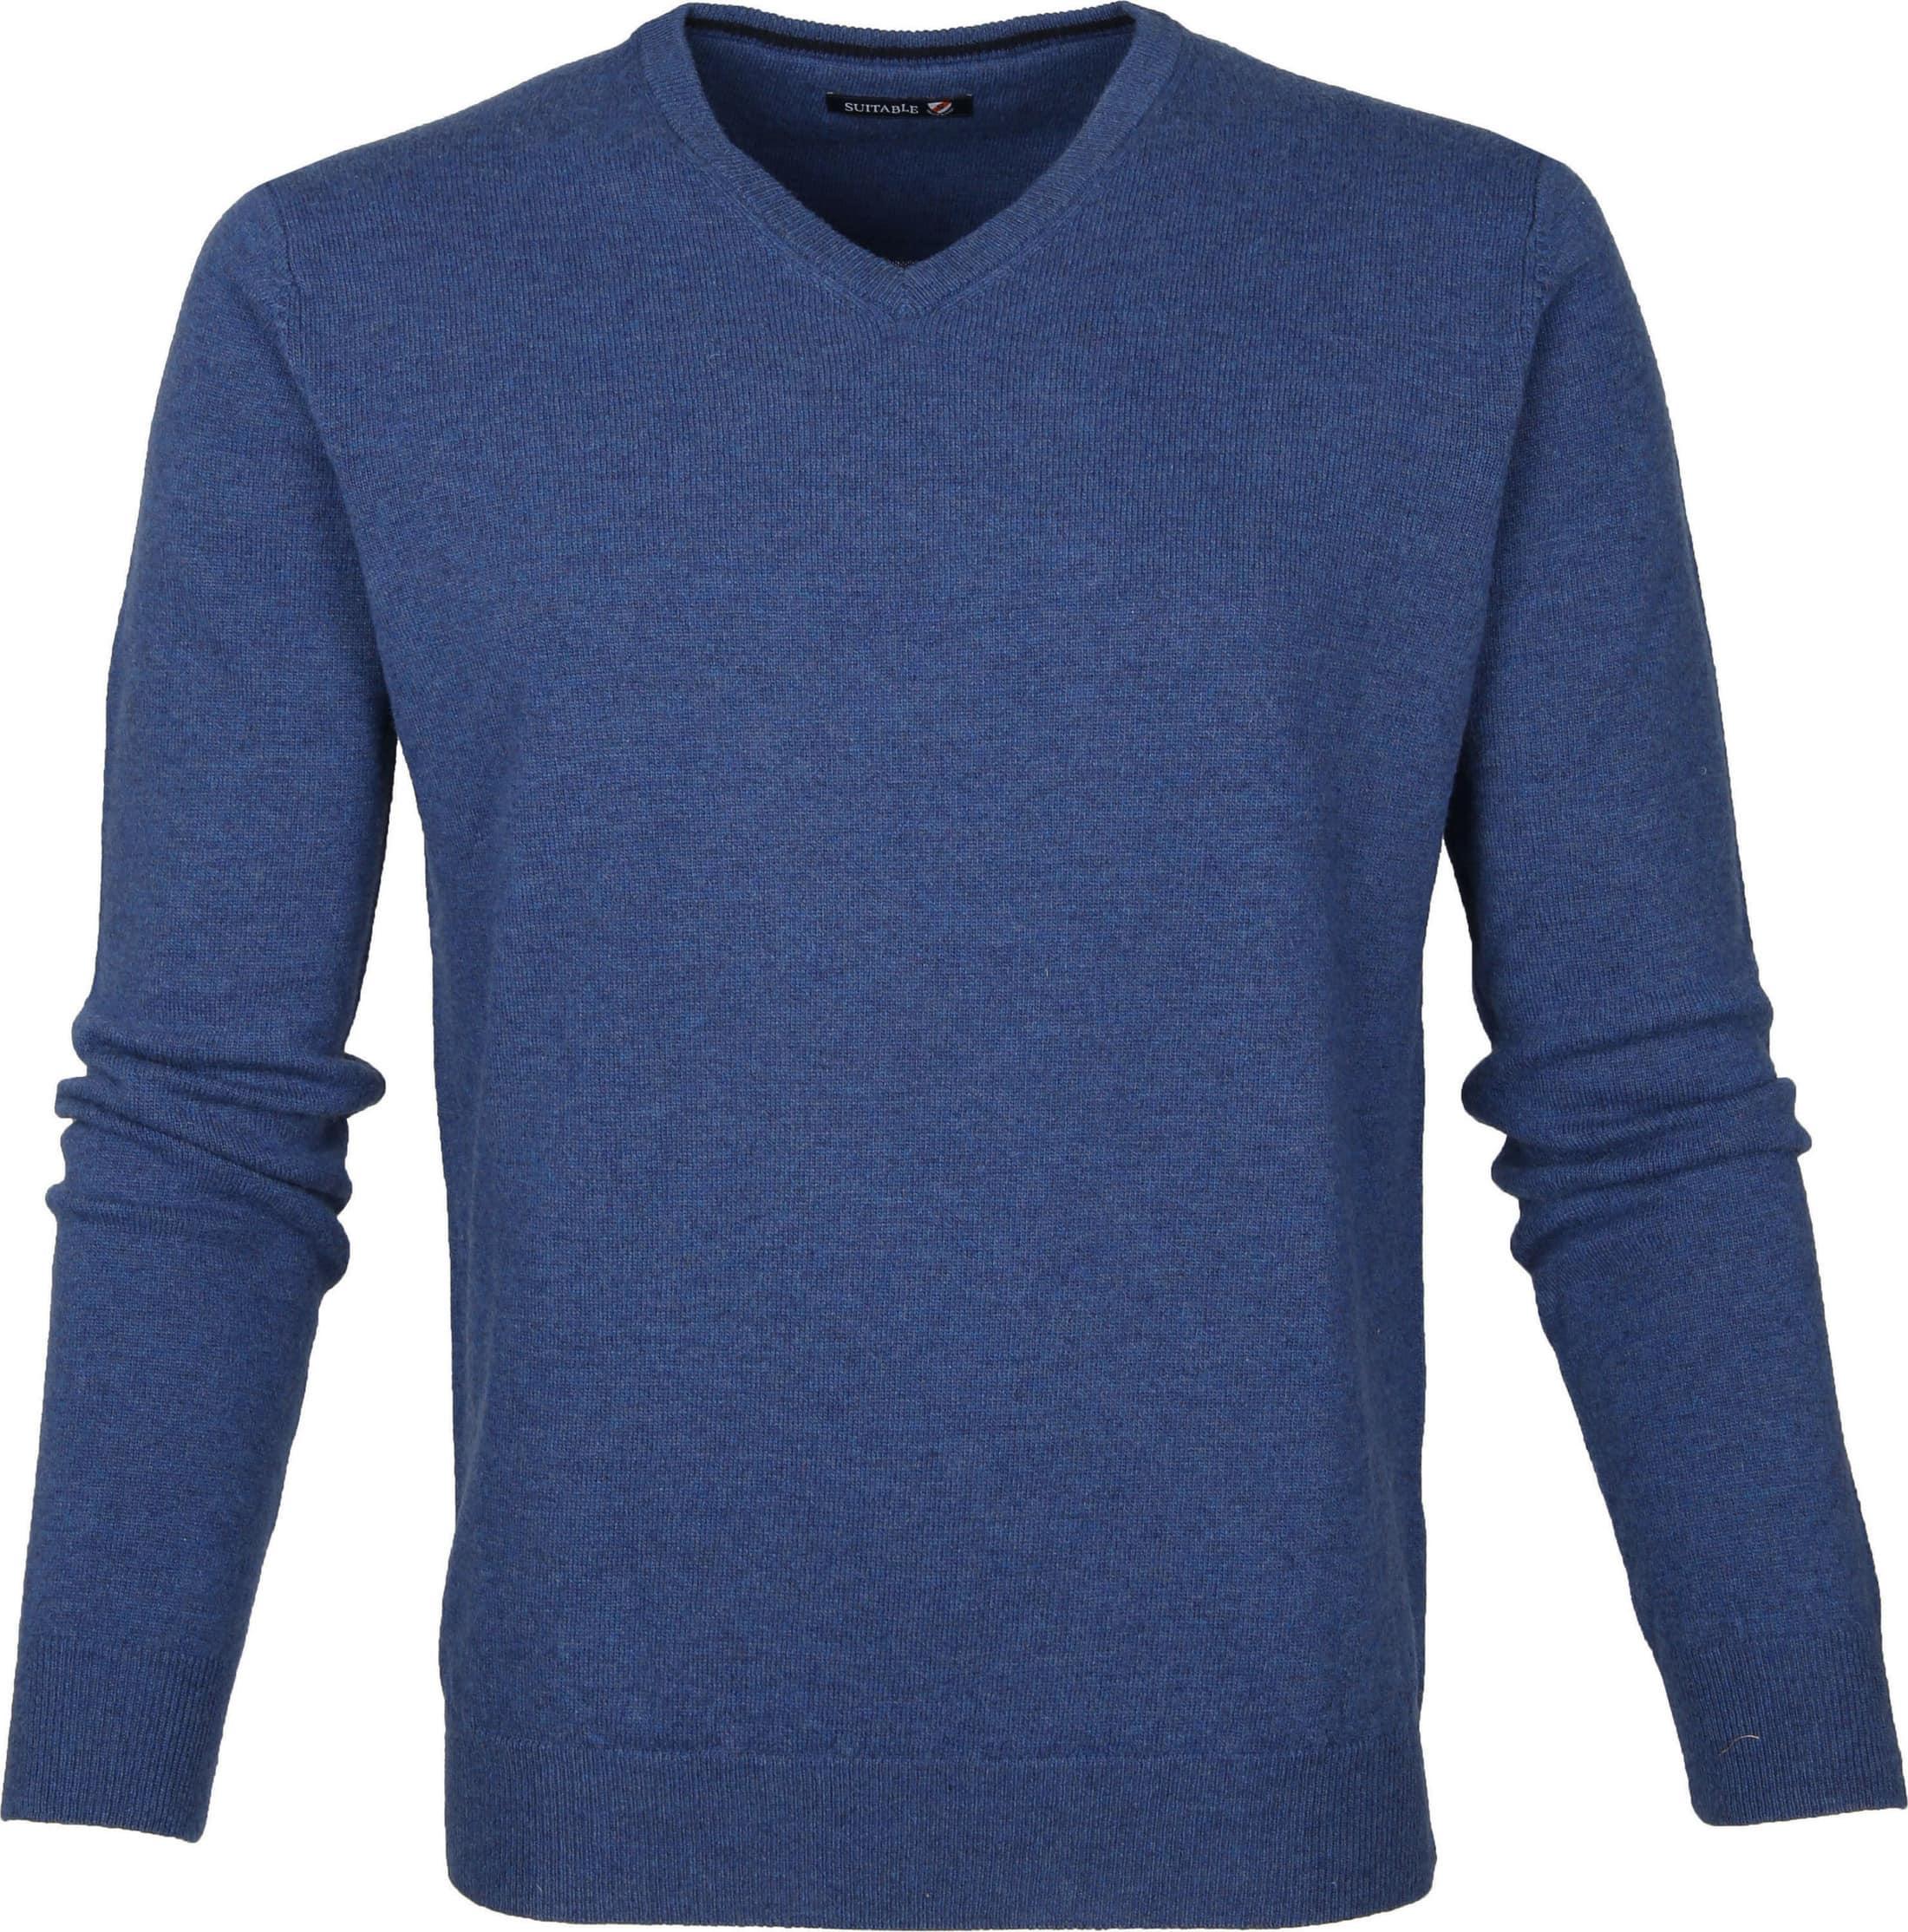 Suitable Pullover Lammwolle V-Ausschnitt Blau foto 0